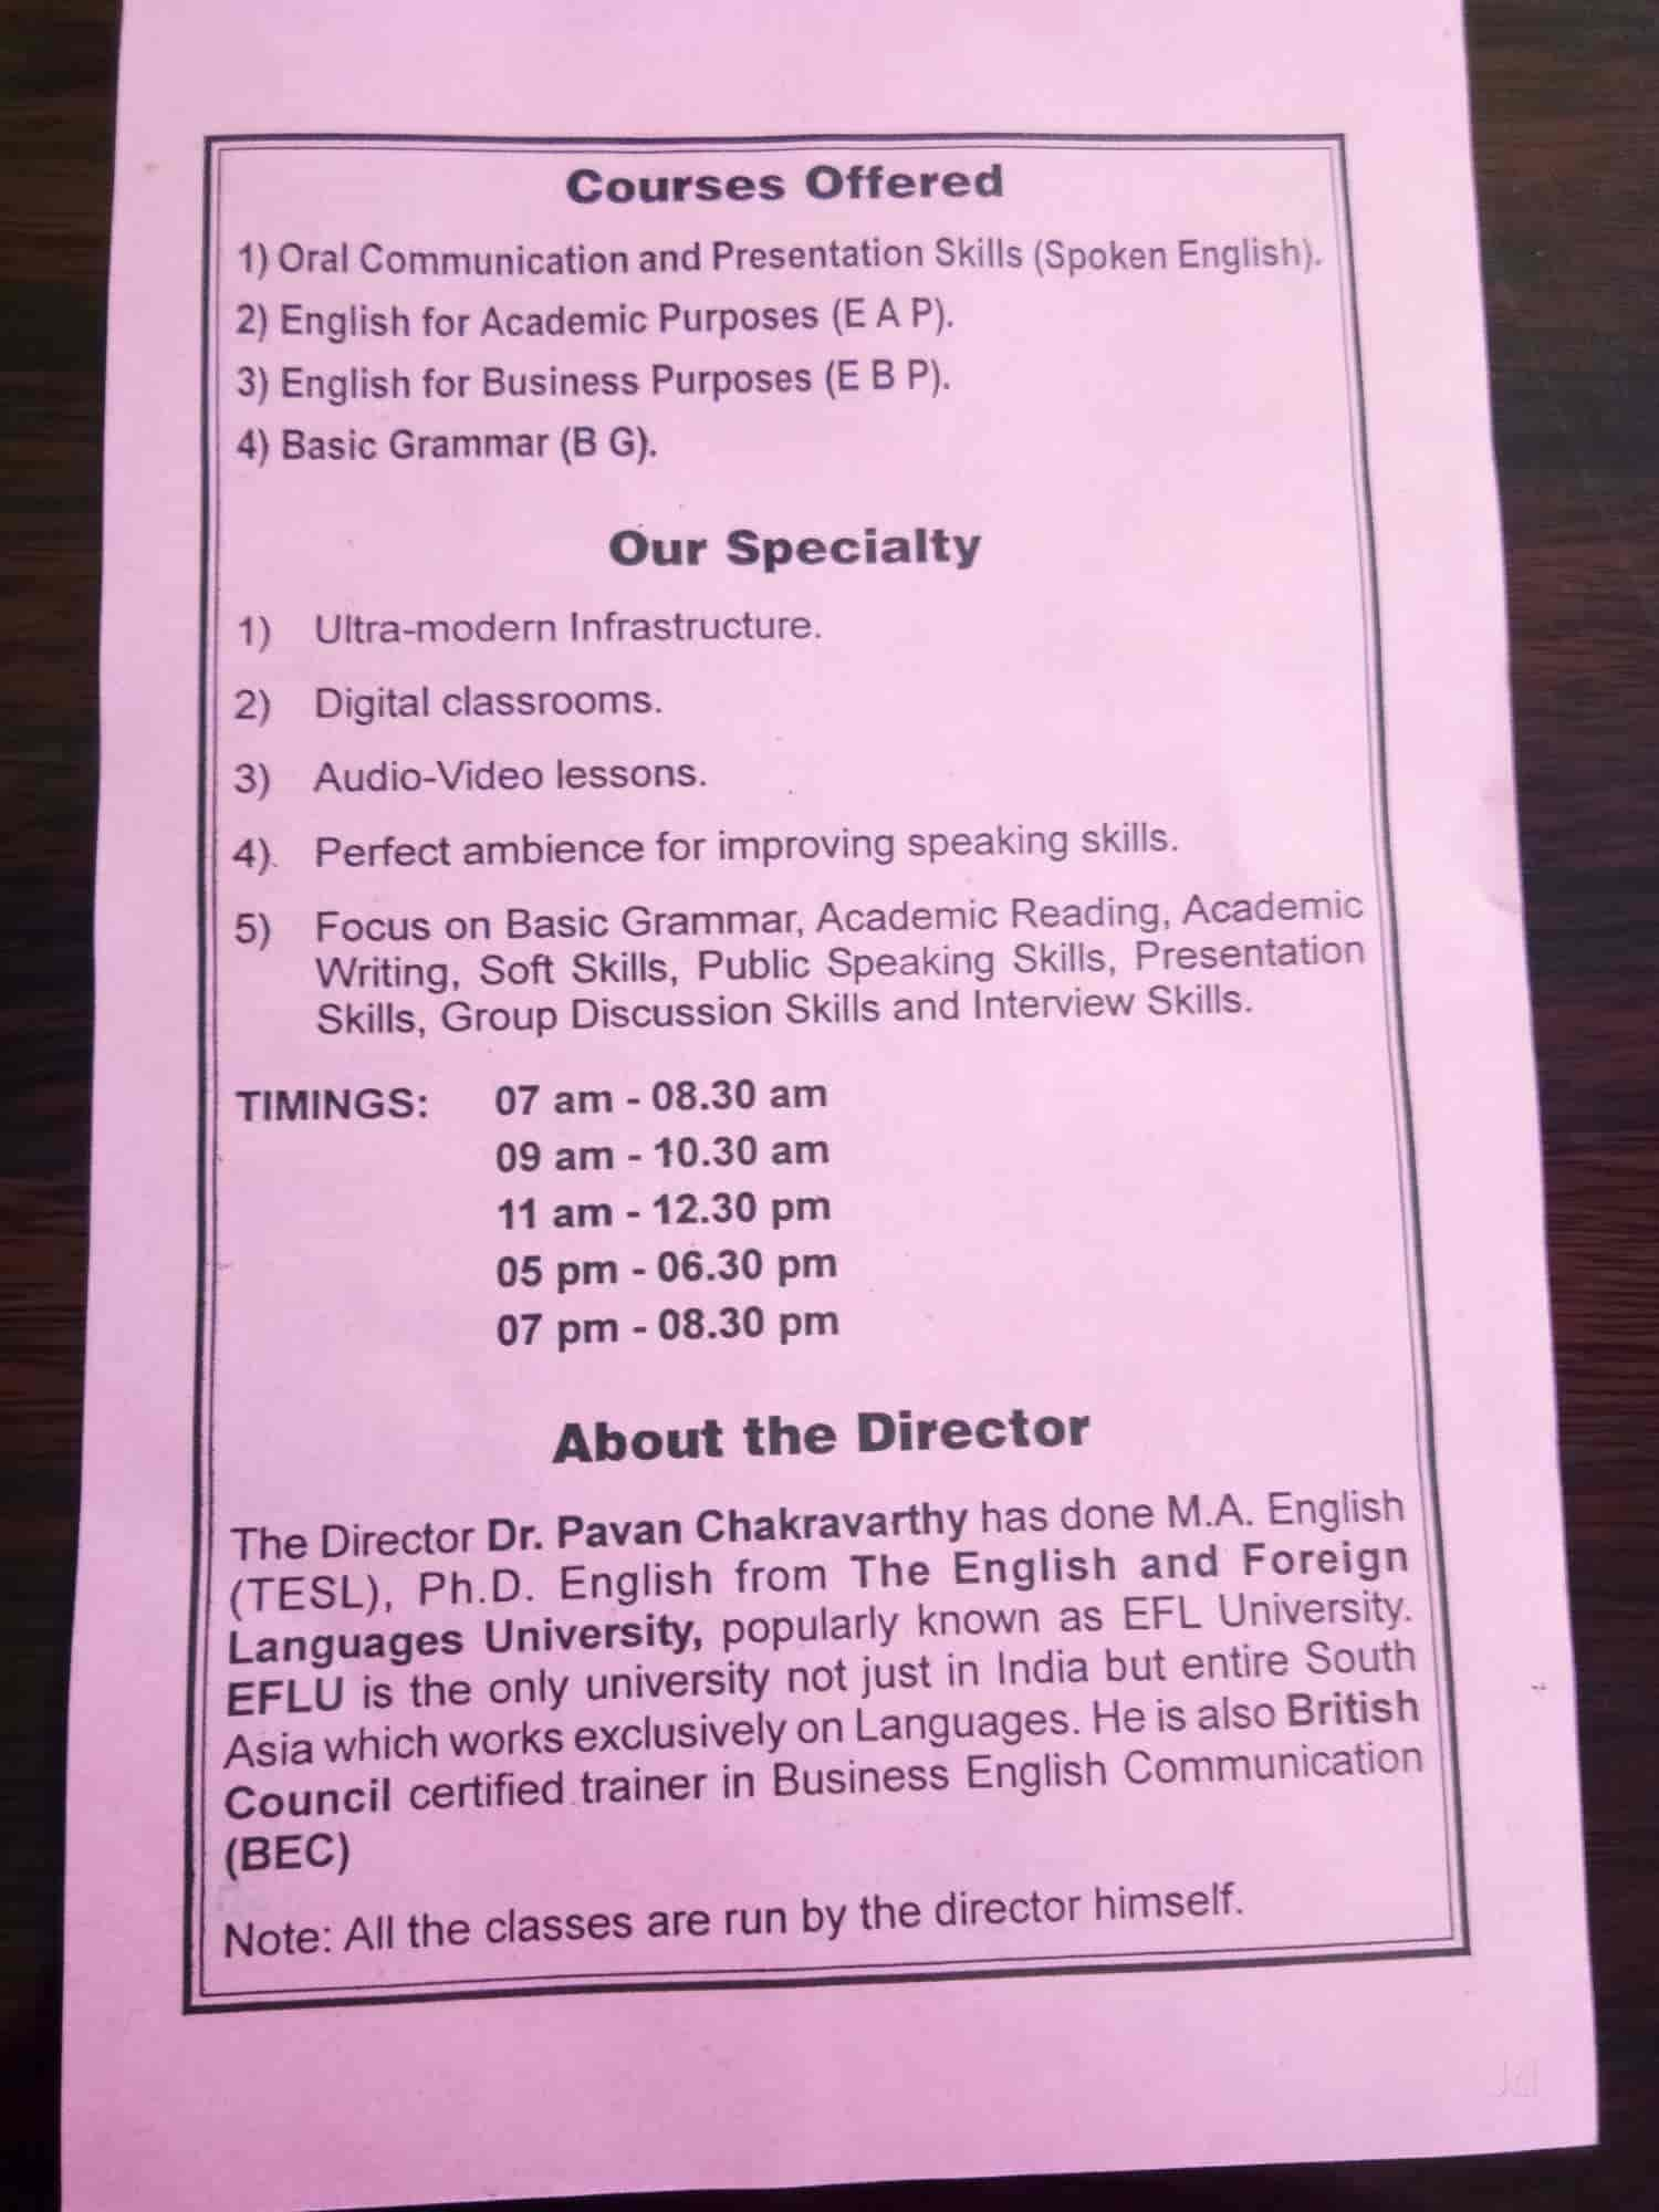 Dr Pavans Spoken English, Tarnaka - Language Classes For